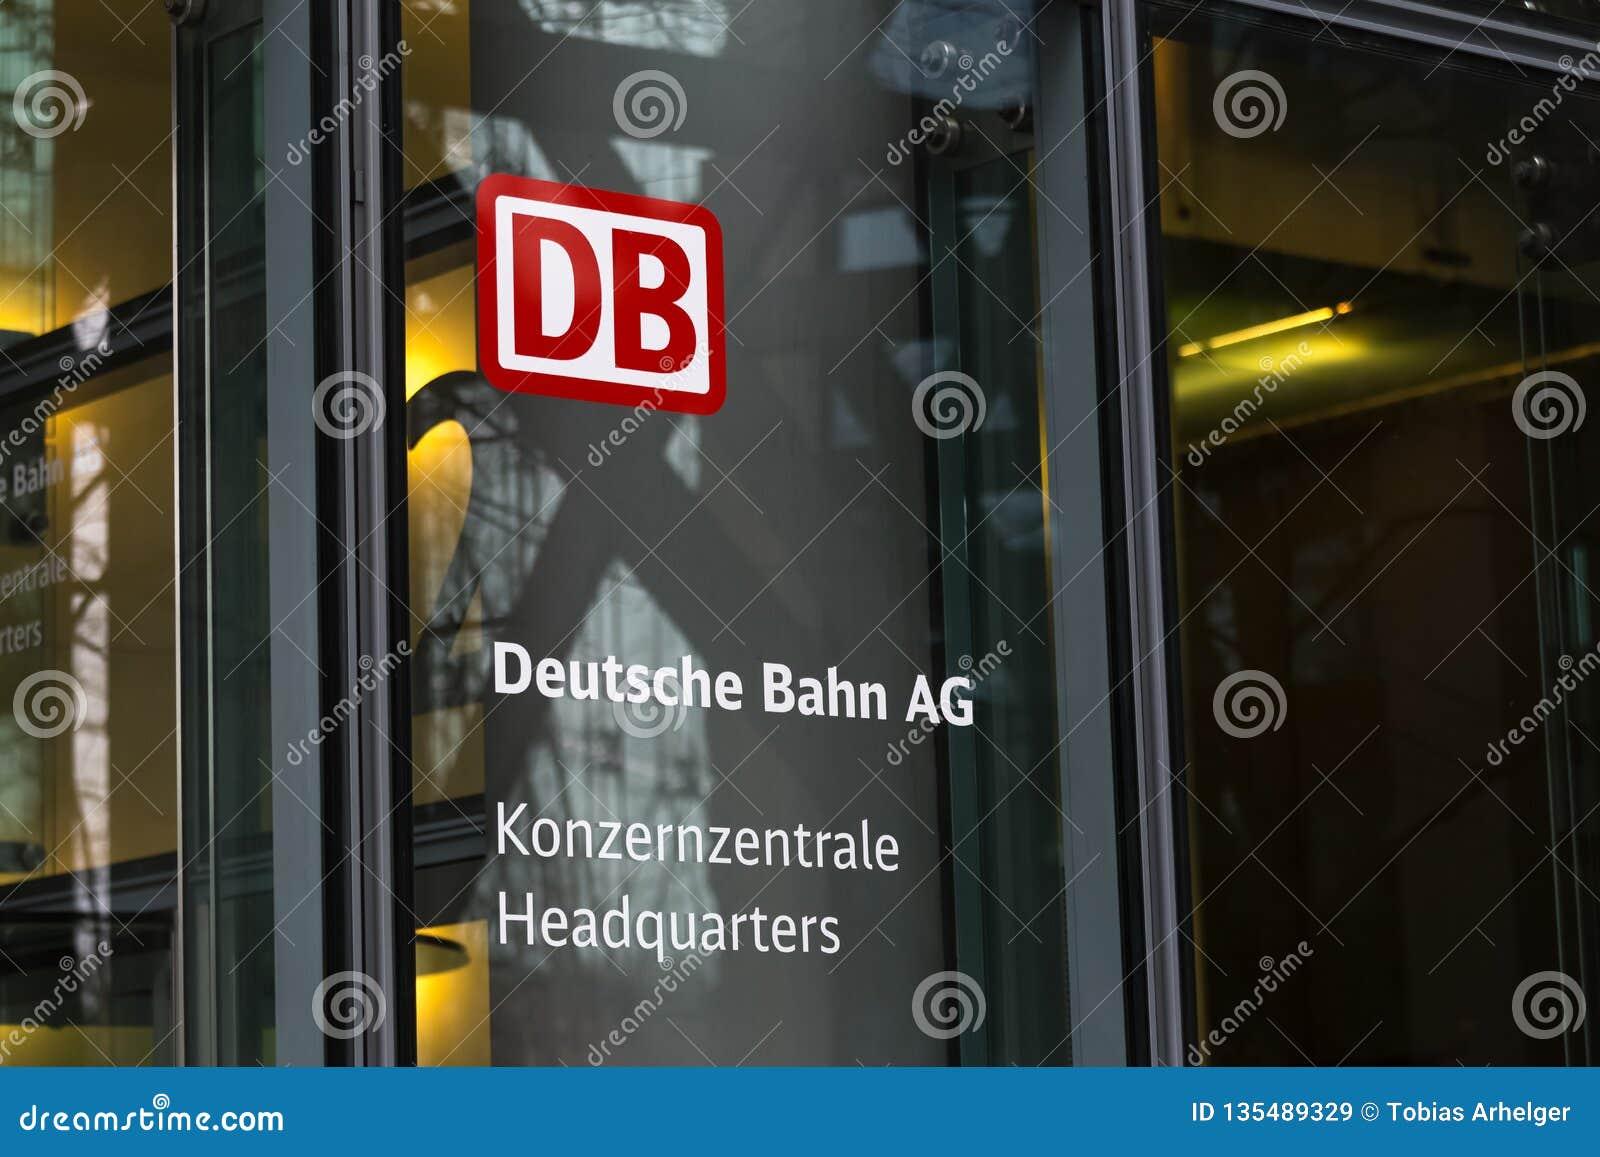 Berlin, Berlin/Deutschland - 24 12 18: Deutsche Bahn Hauptsitze ragen Berlin Deutschland hoch